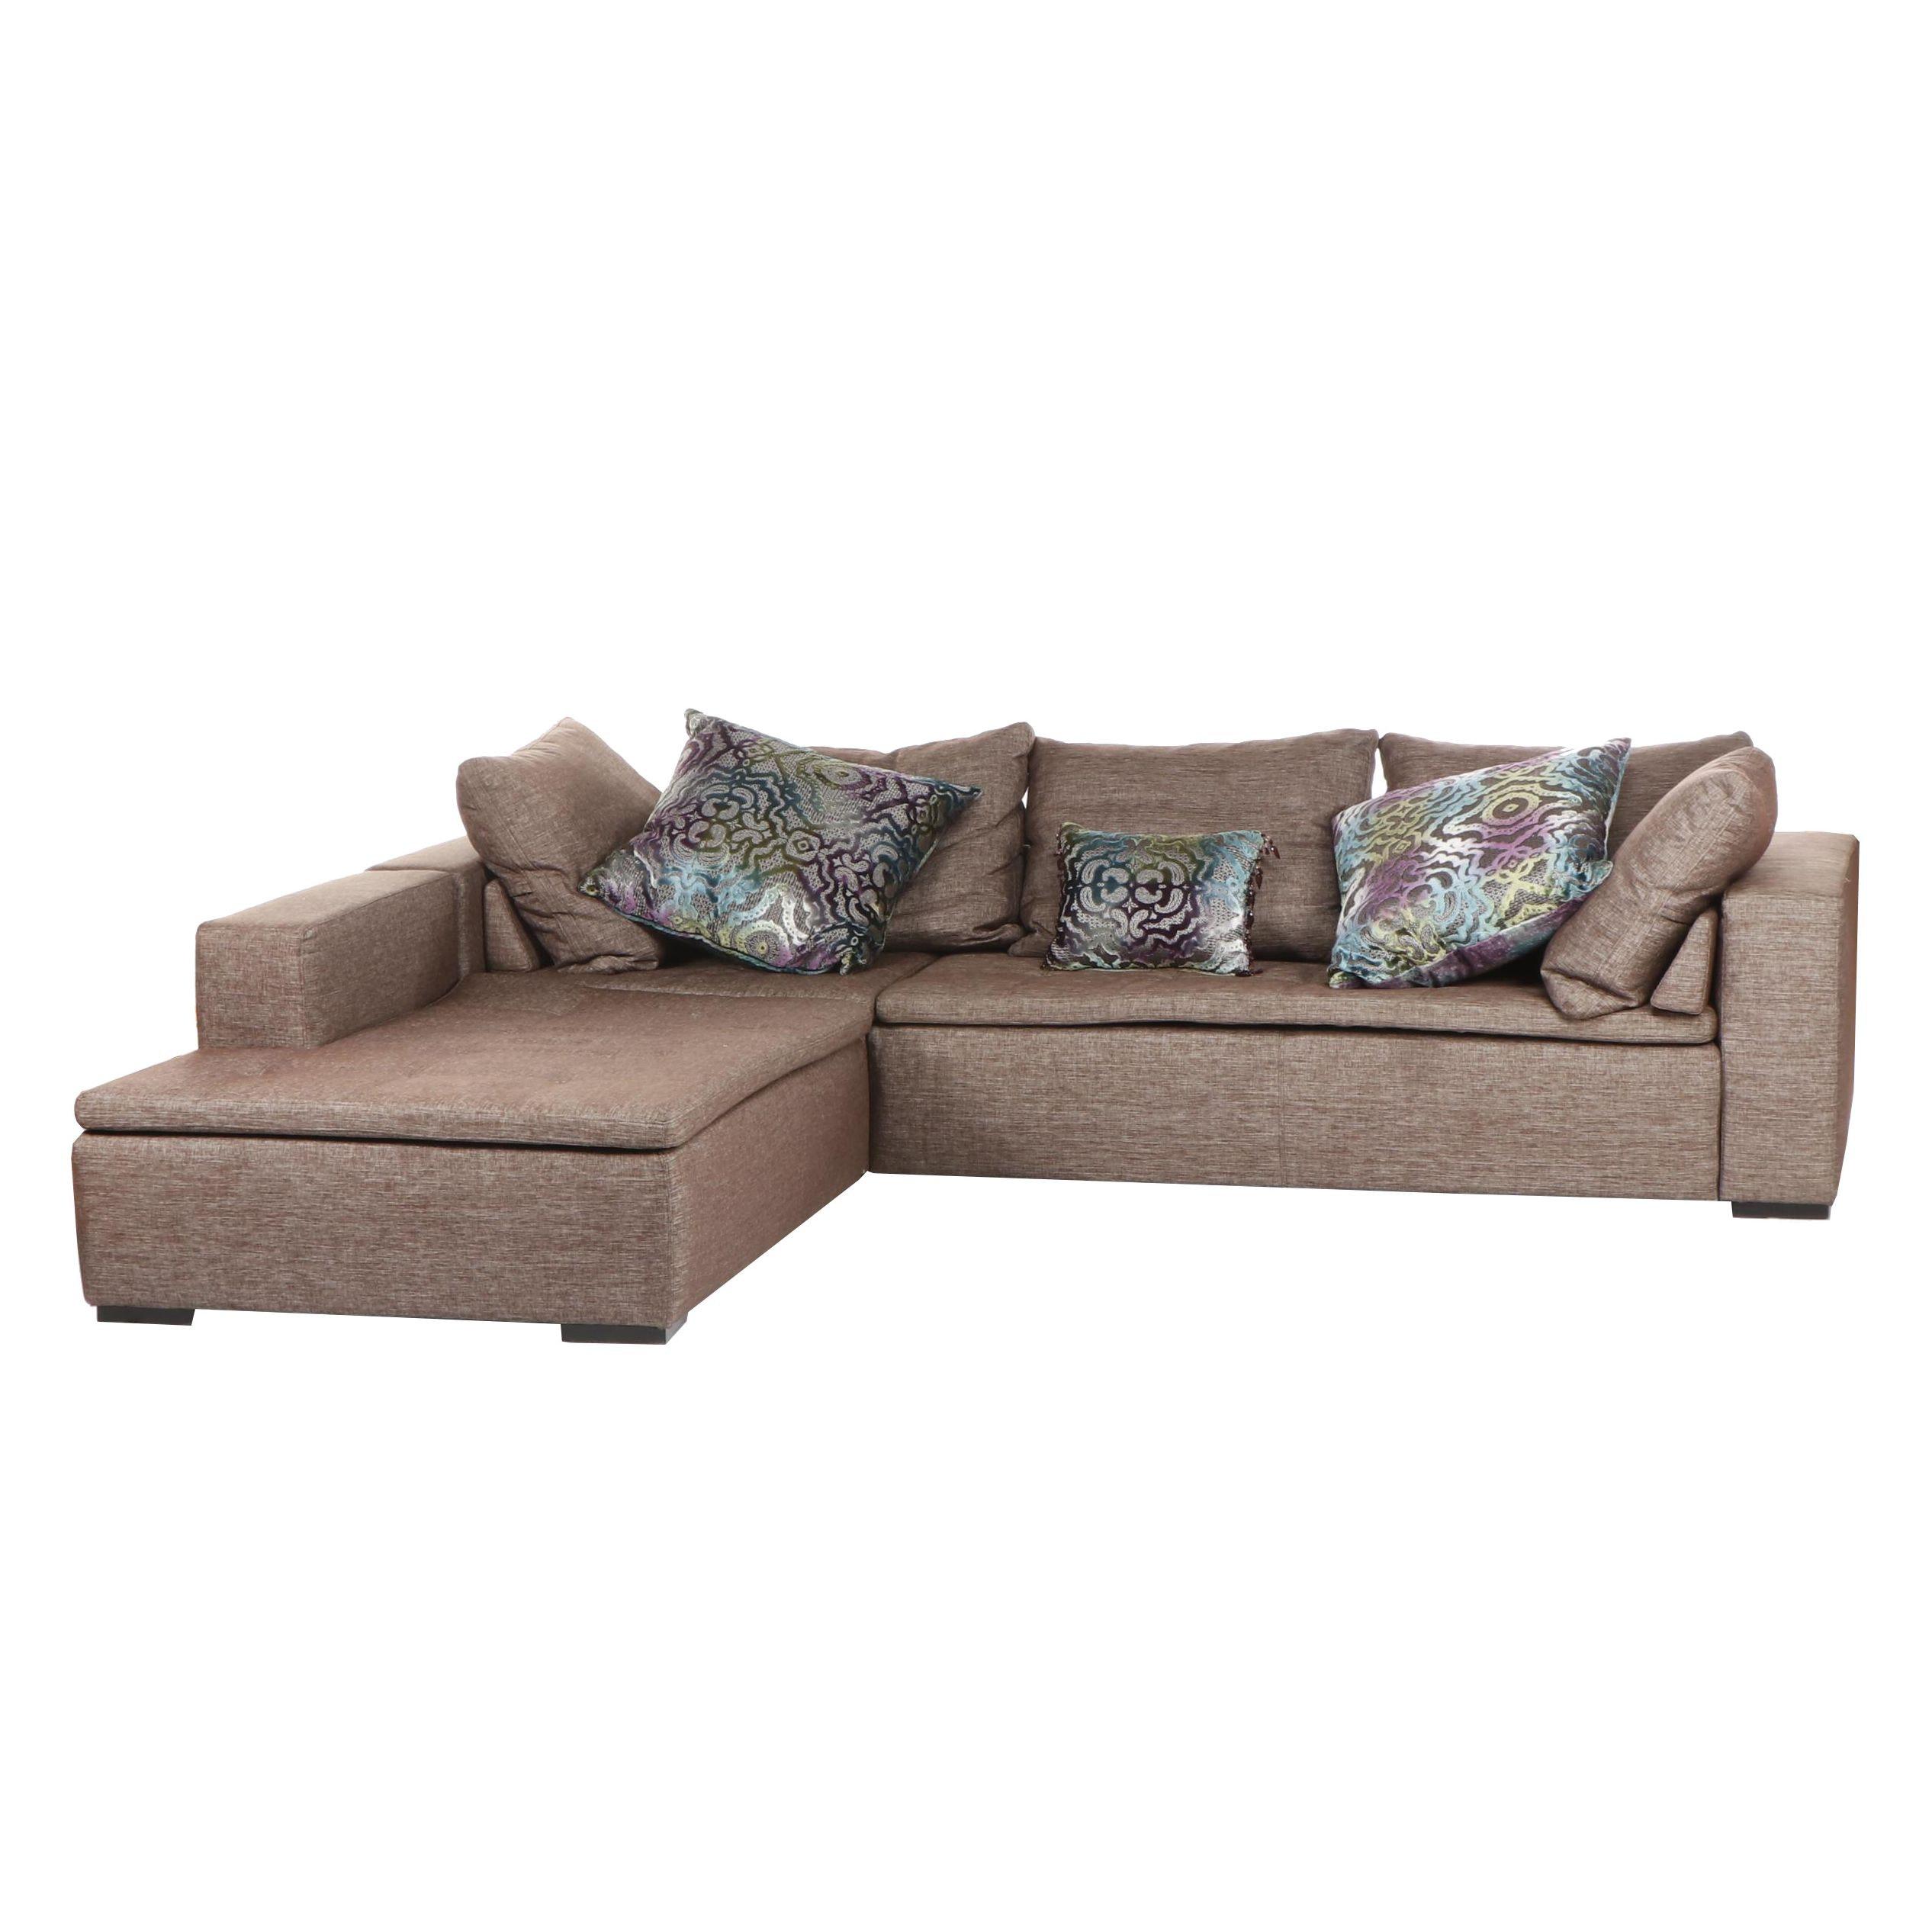 "Boconcept ""Mezzo"" Contemporary Modern Gray Sectional Corner Sofa"